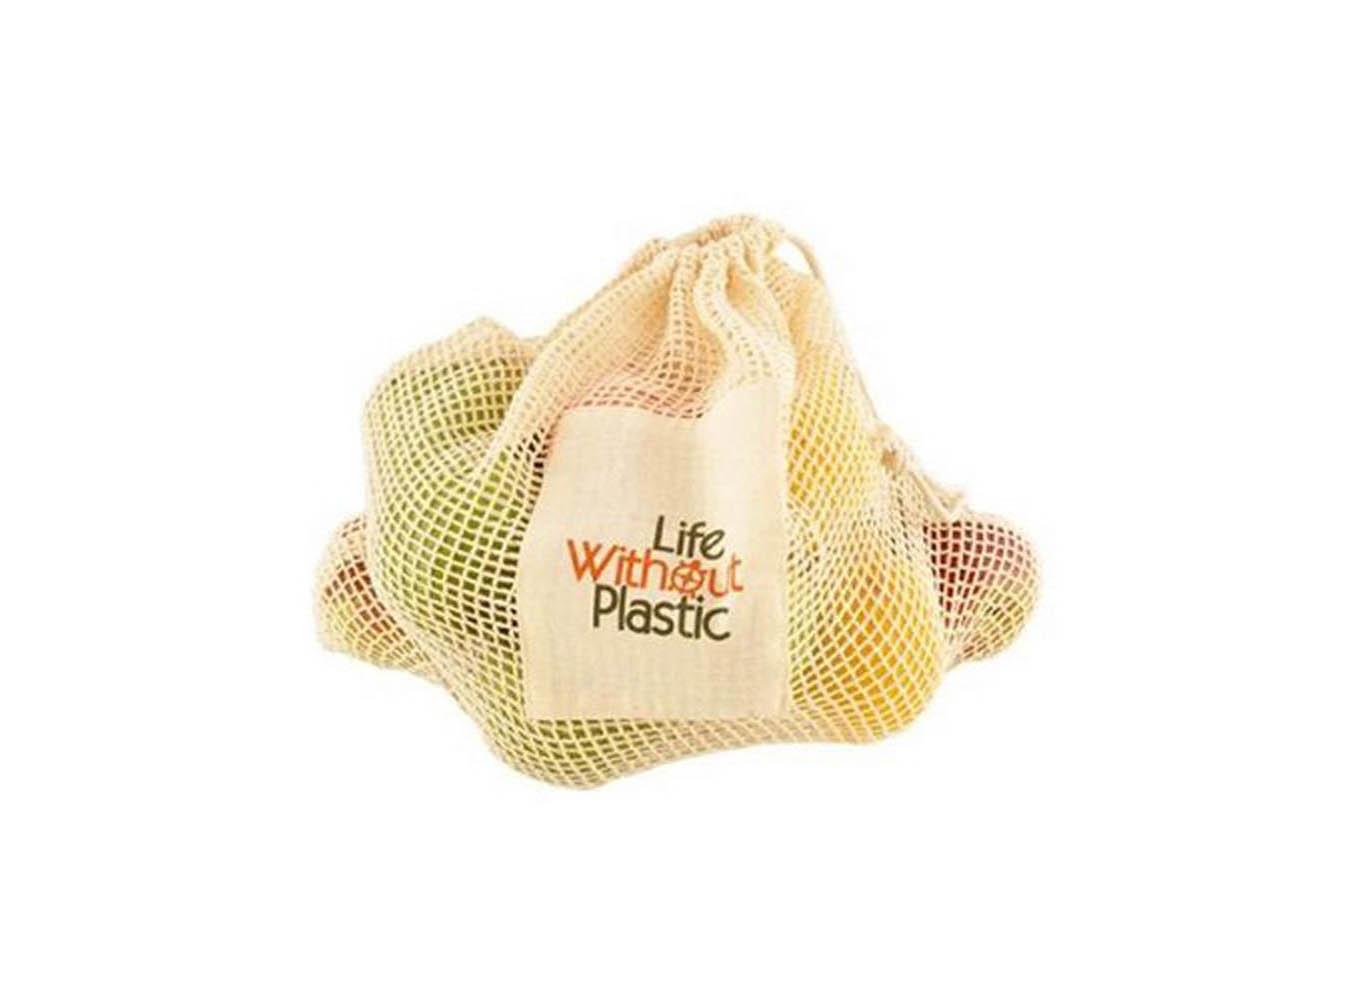 Custom Printed Reusable Mesh Produce Bag